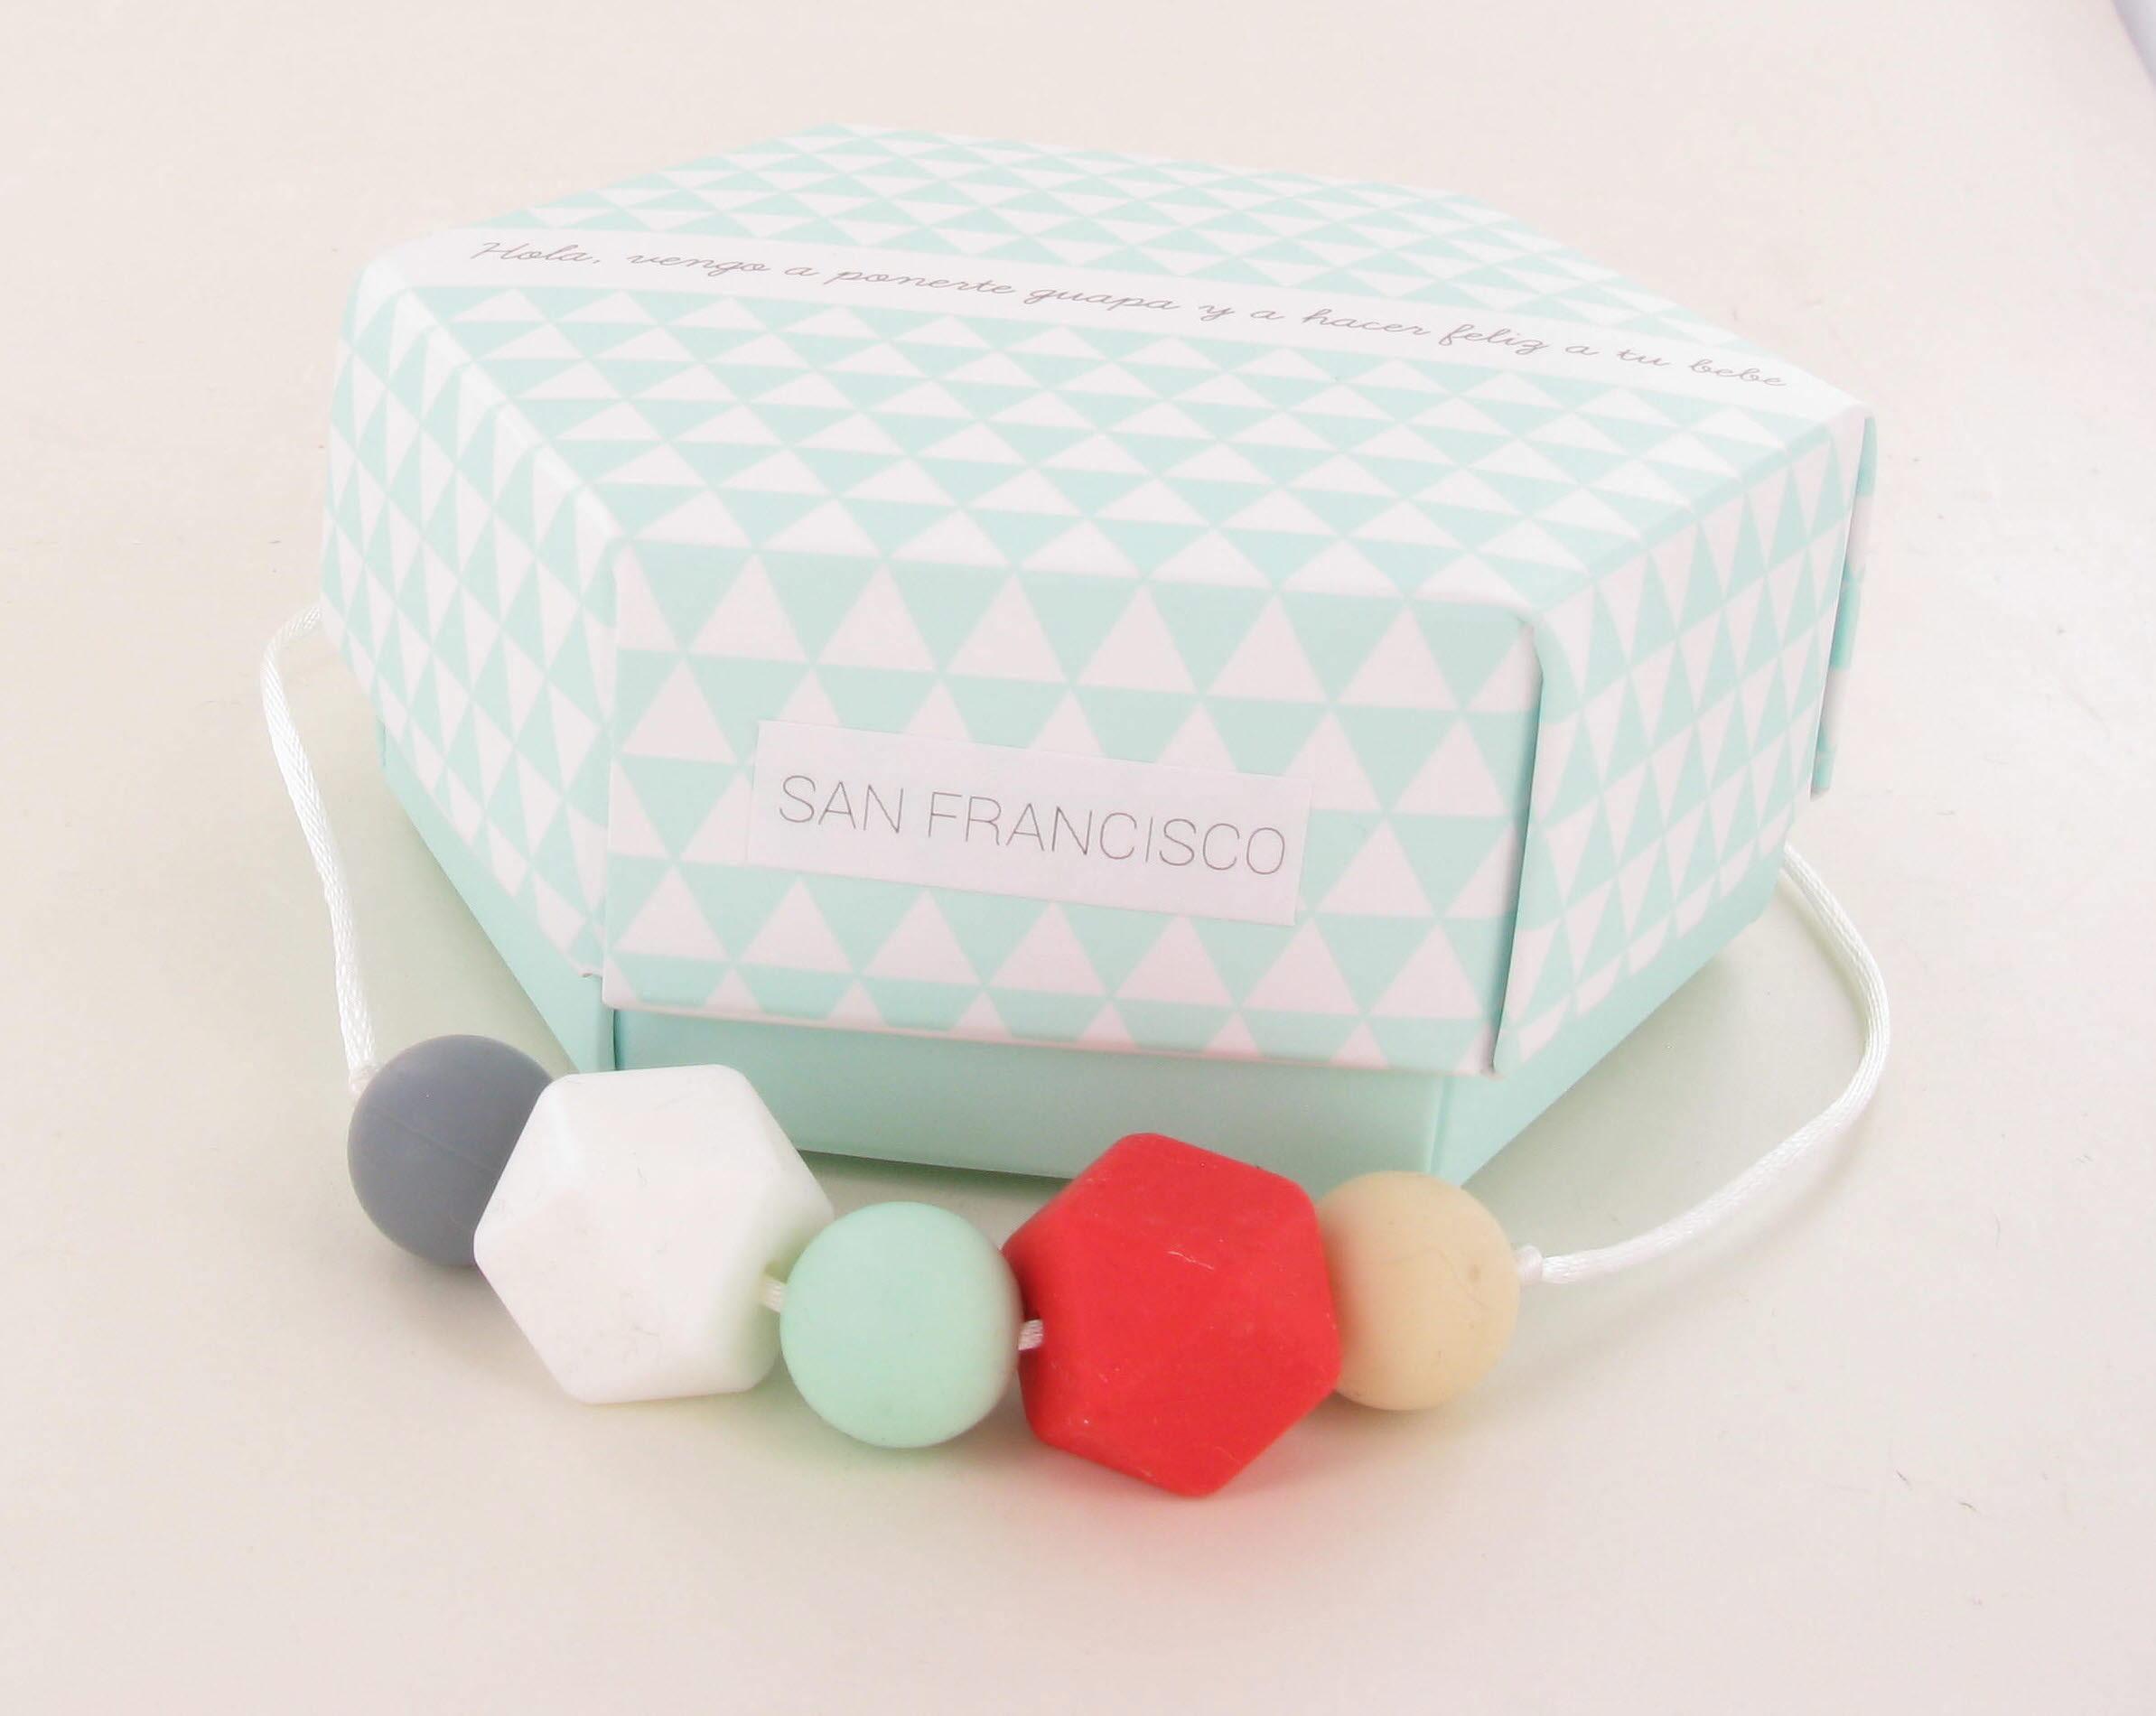 San-Francisco-Packaging_MBB1337